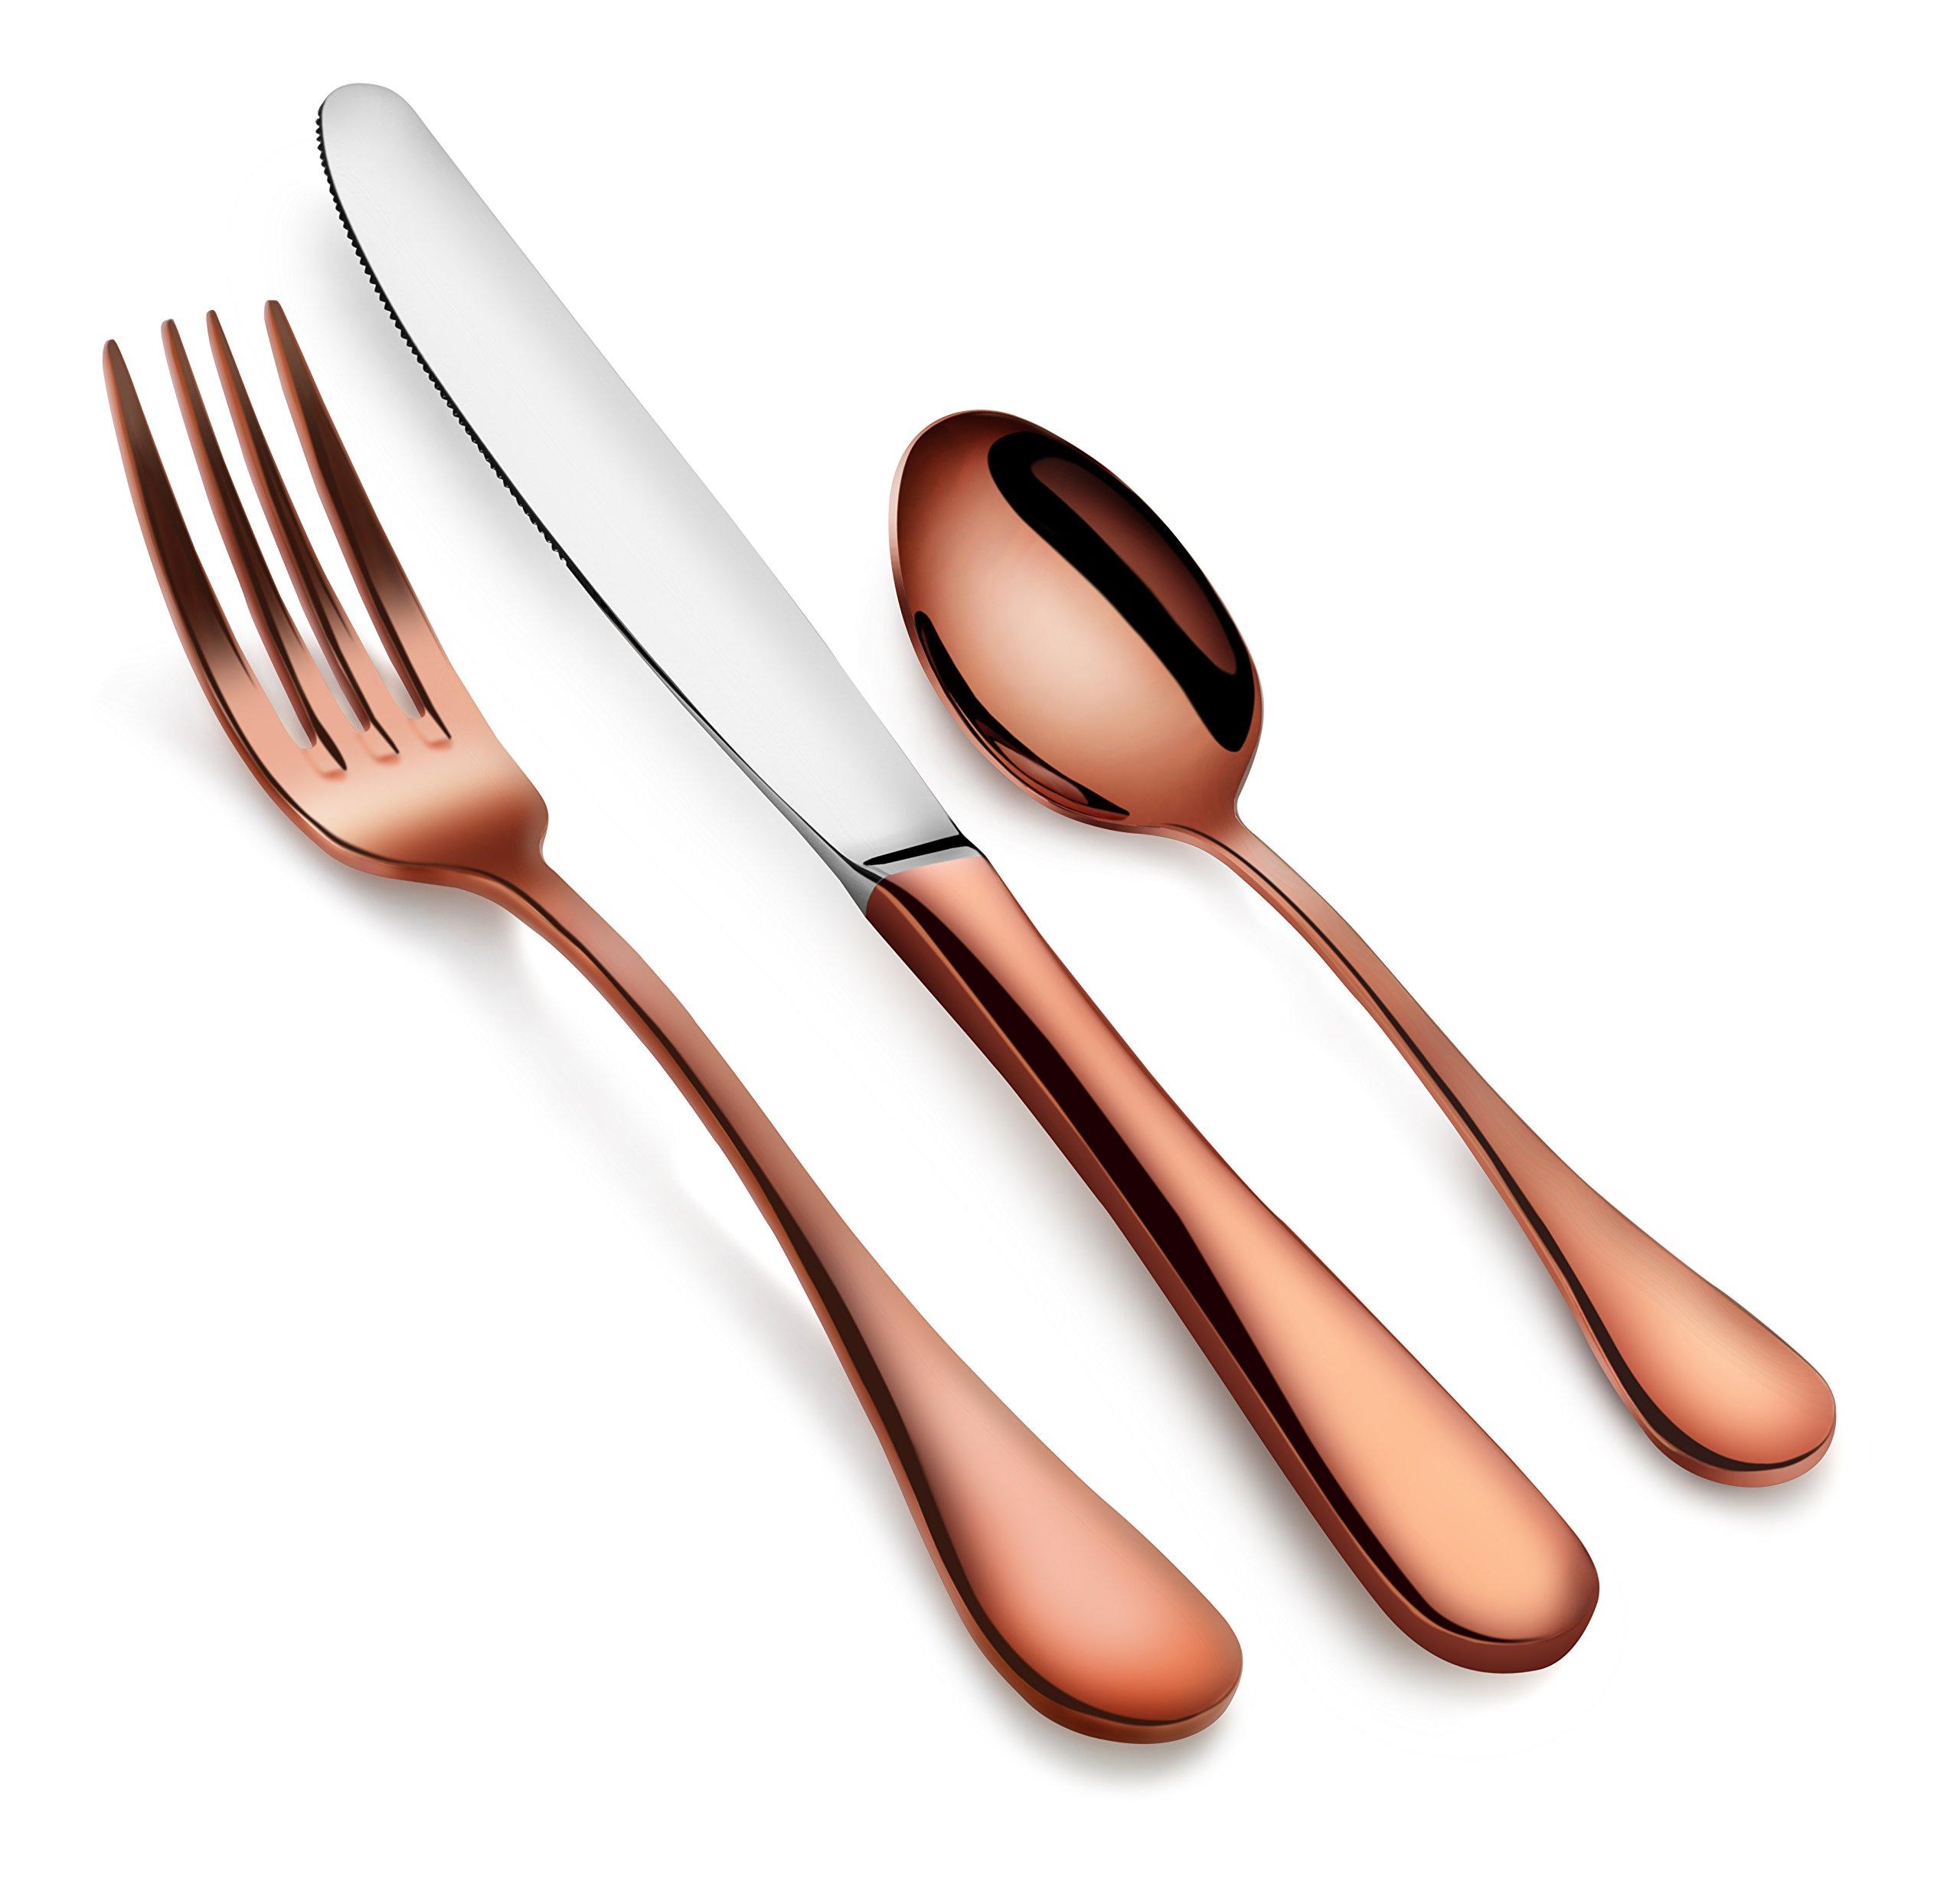 Artaste 56419 Rain 18/10 Stainless Steel Flatware 36 Piece Set, Antique Copper Finished, Service for 12